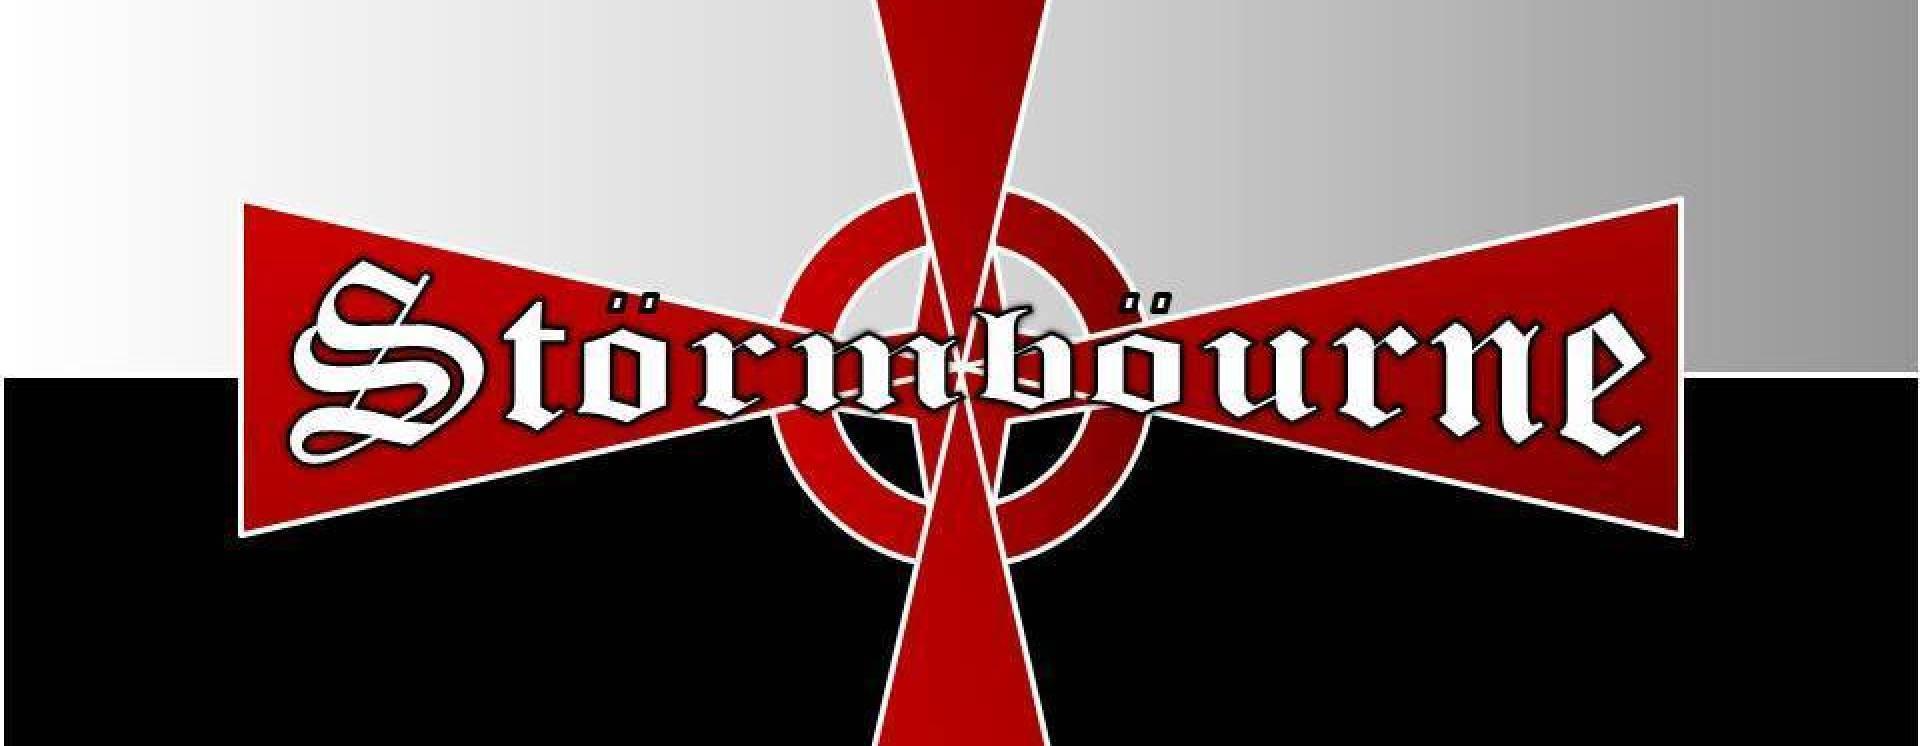 1426474159 stormbourne logo4 copy